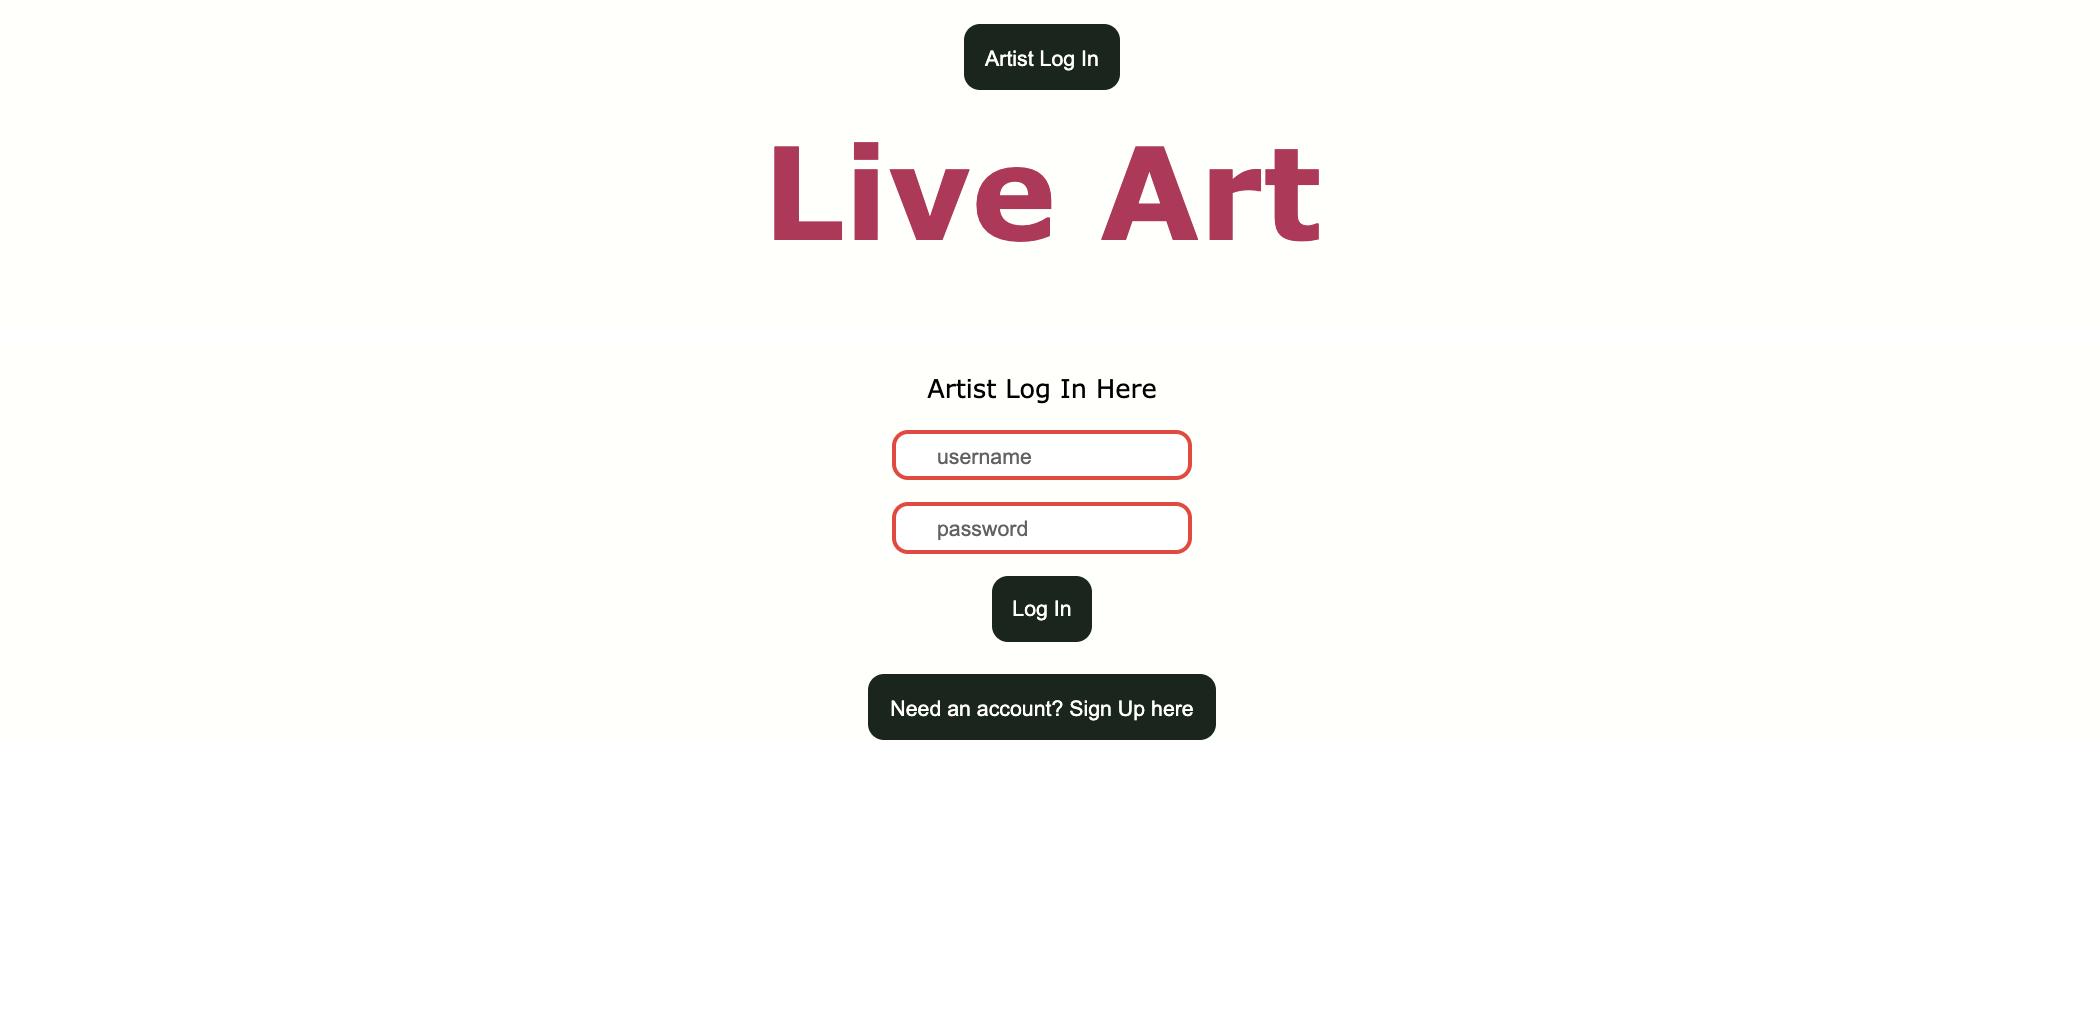 Artist Login